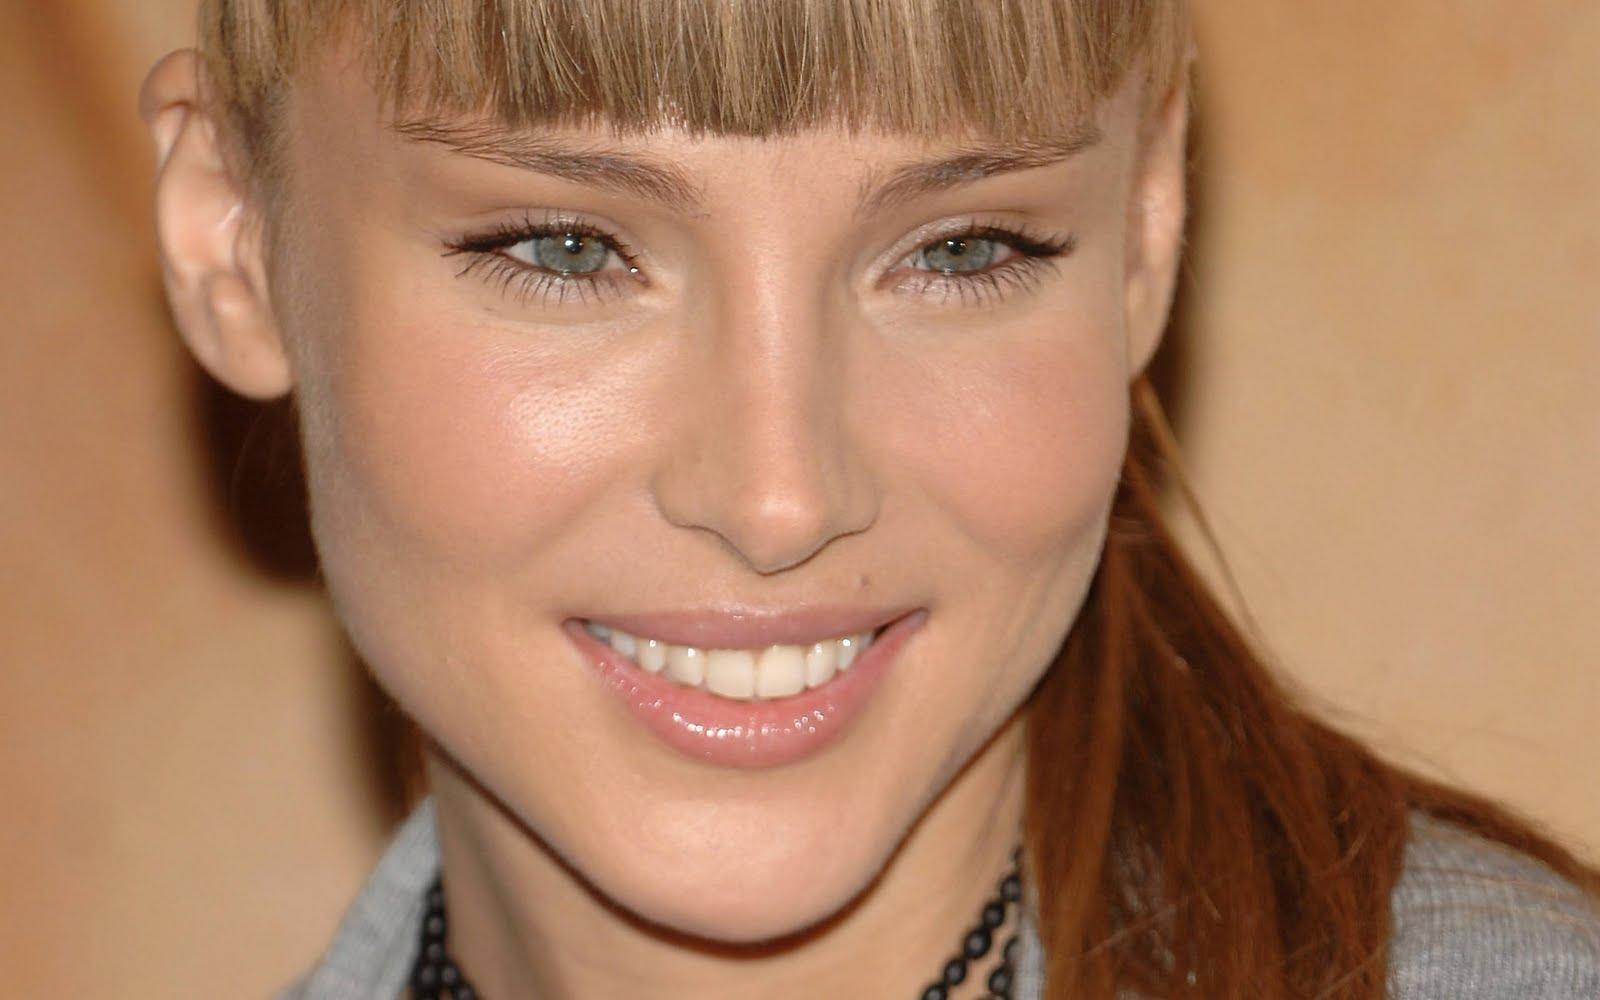 http://3.bp.blogspot.com/-WU4sbcyIX58/TjE8qr0RPVI/AAAAAAAACy0/_bfmAgDTce4/s1600/Elsa_Pataky_hd_wallpapers_closeup_smile_look_nice_.jpg